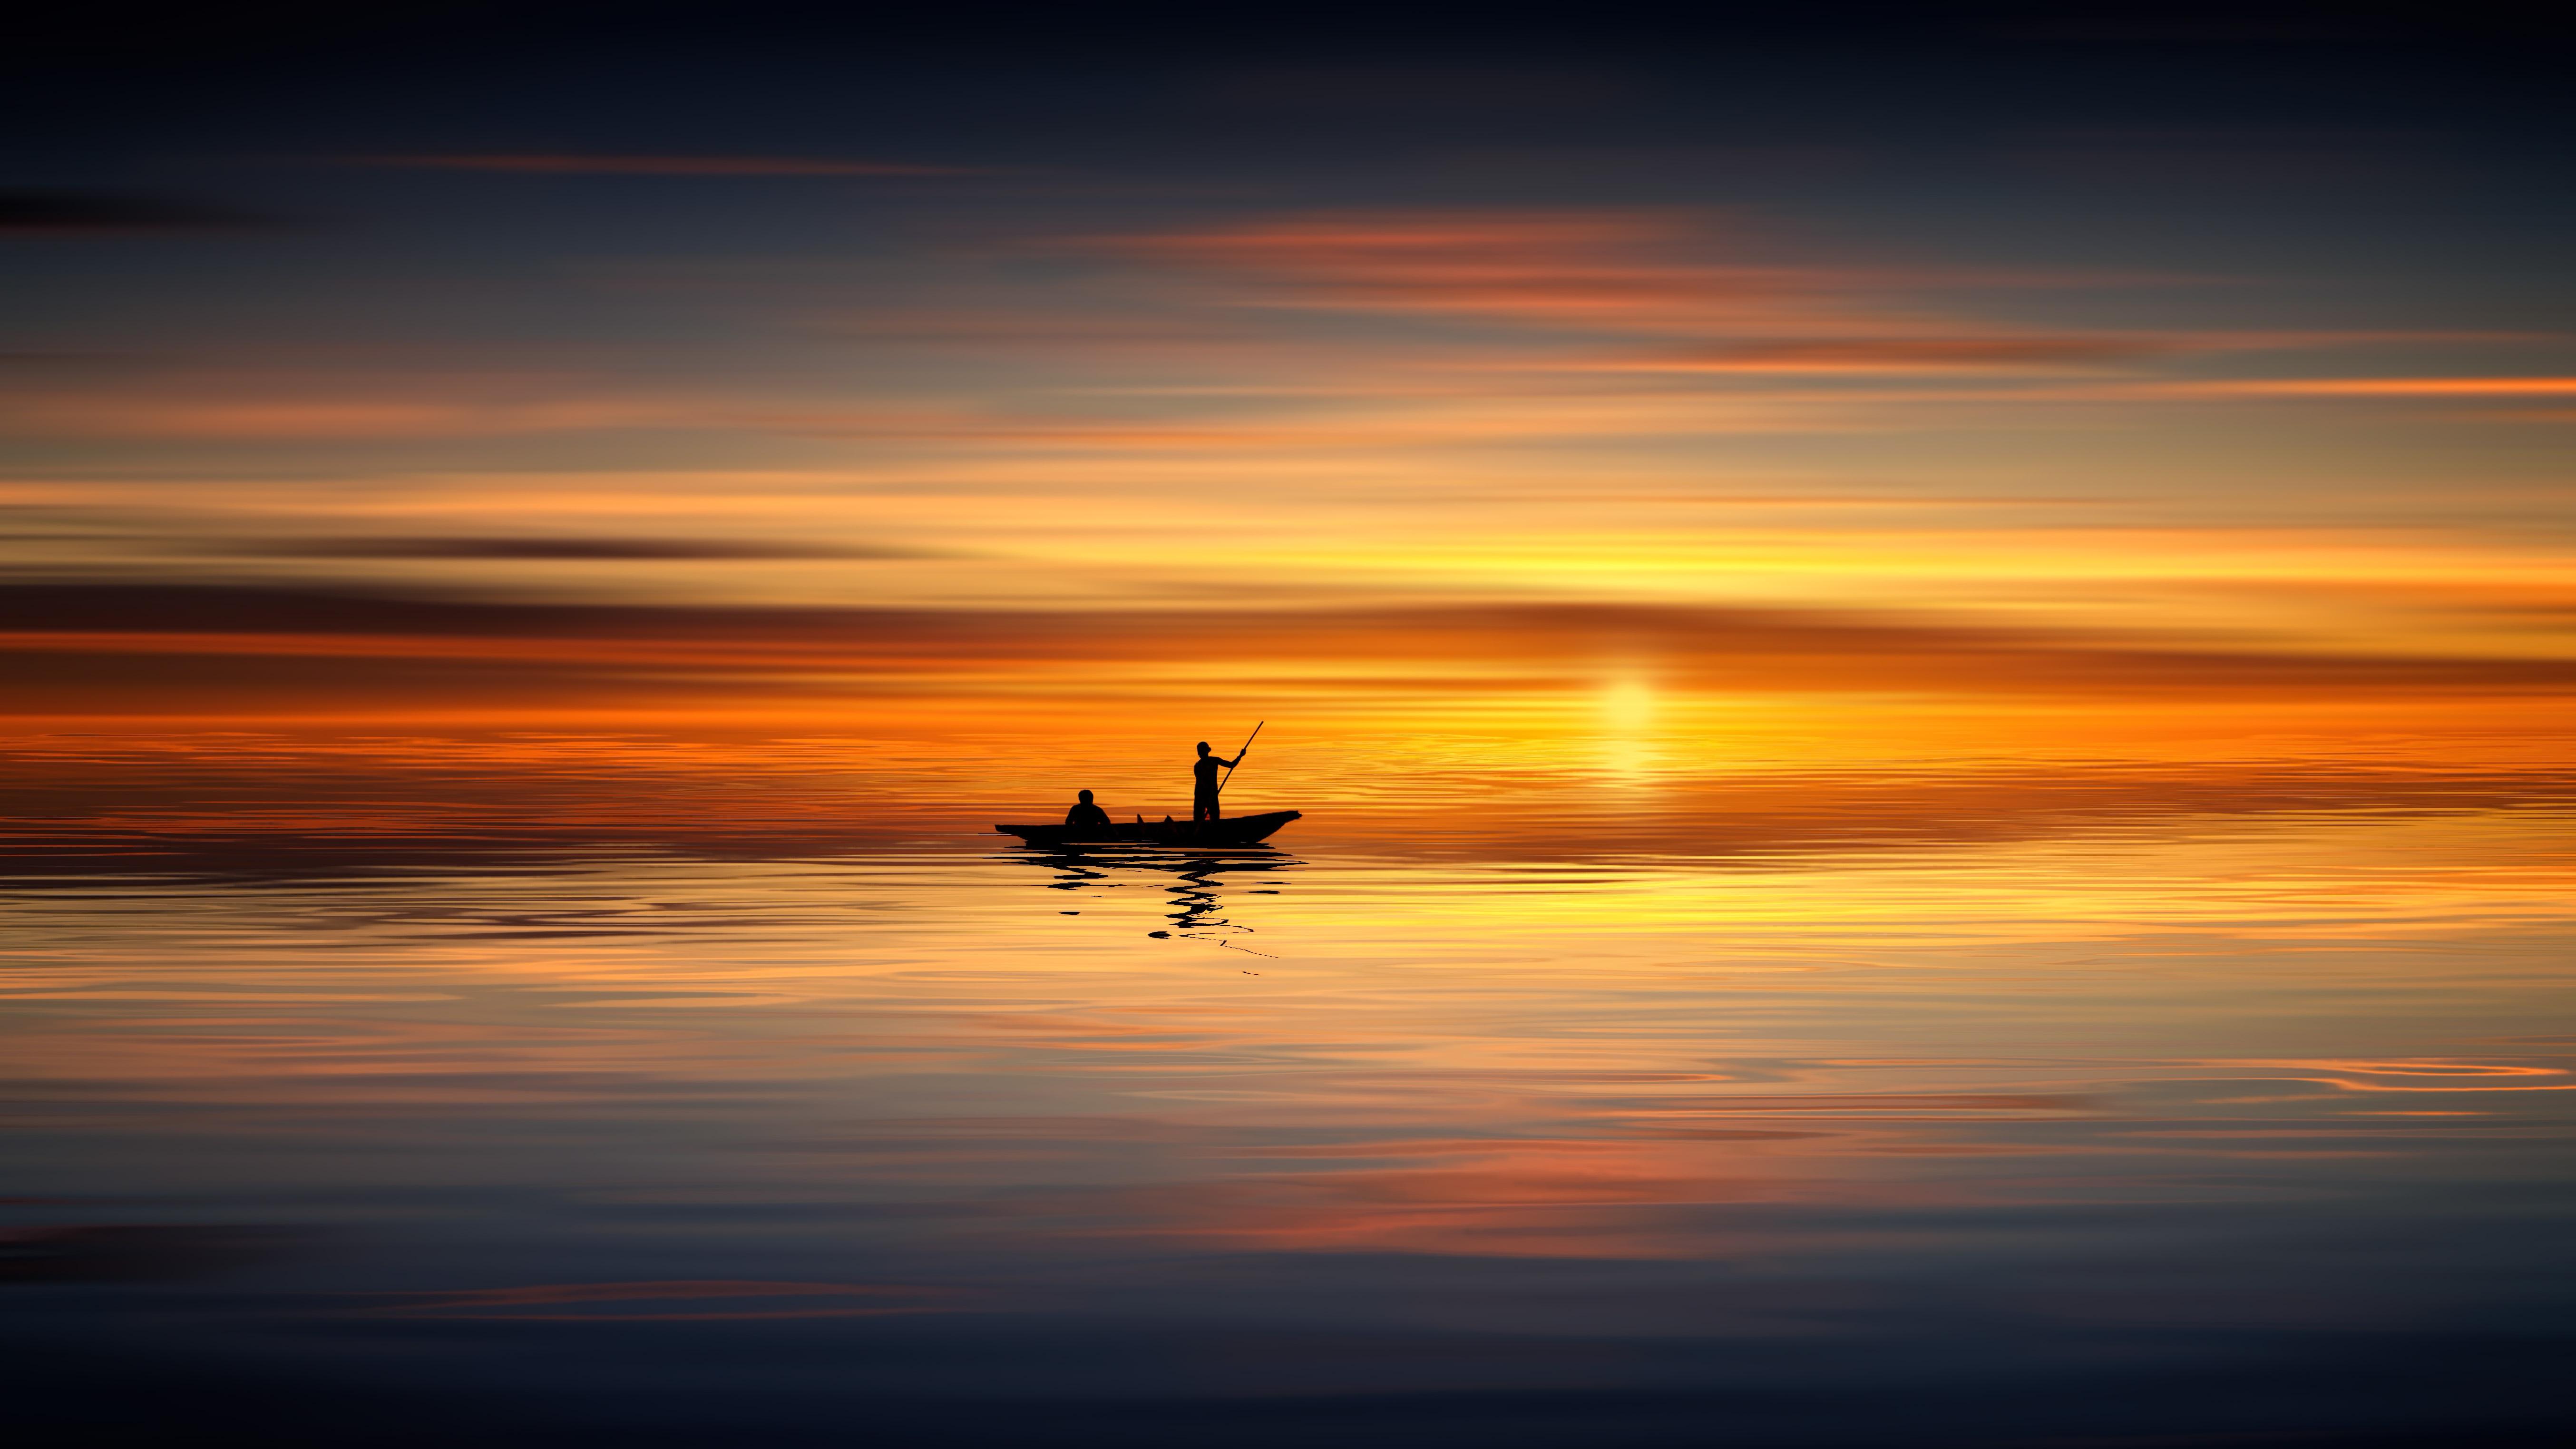 Wallpaper Fisherman Sunset Boat Hd Creative Graphics